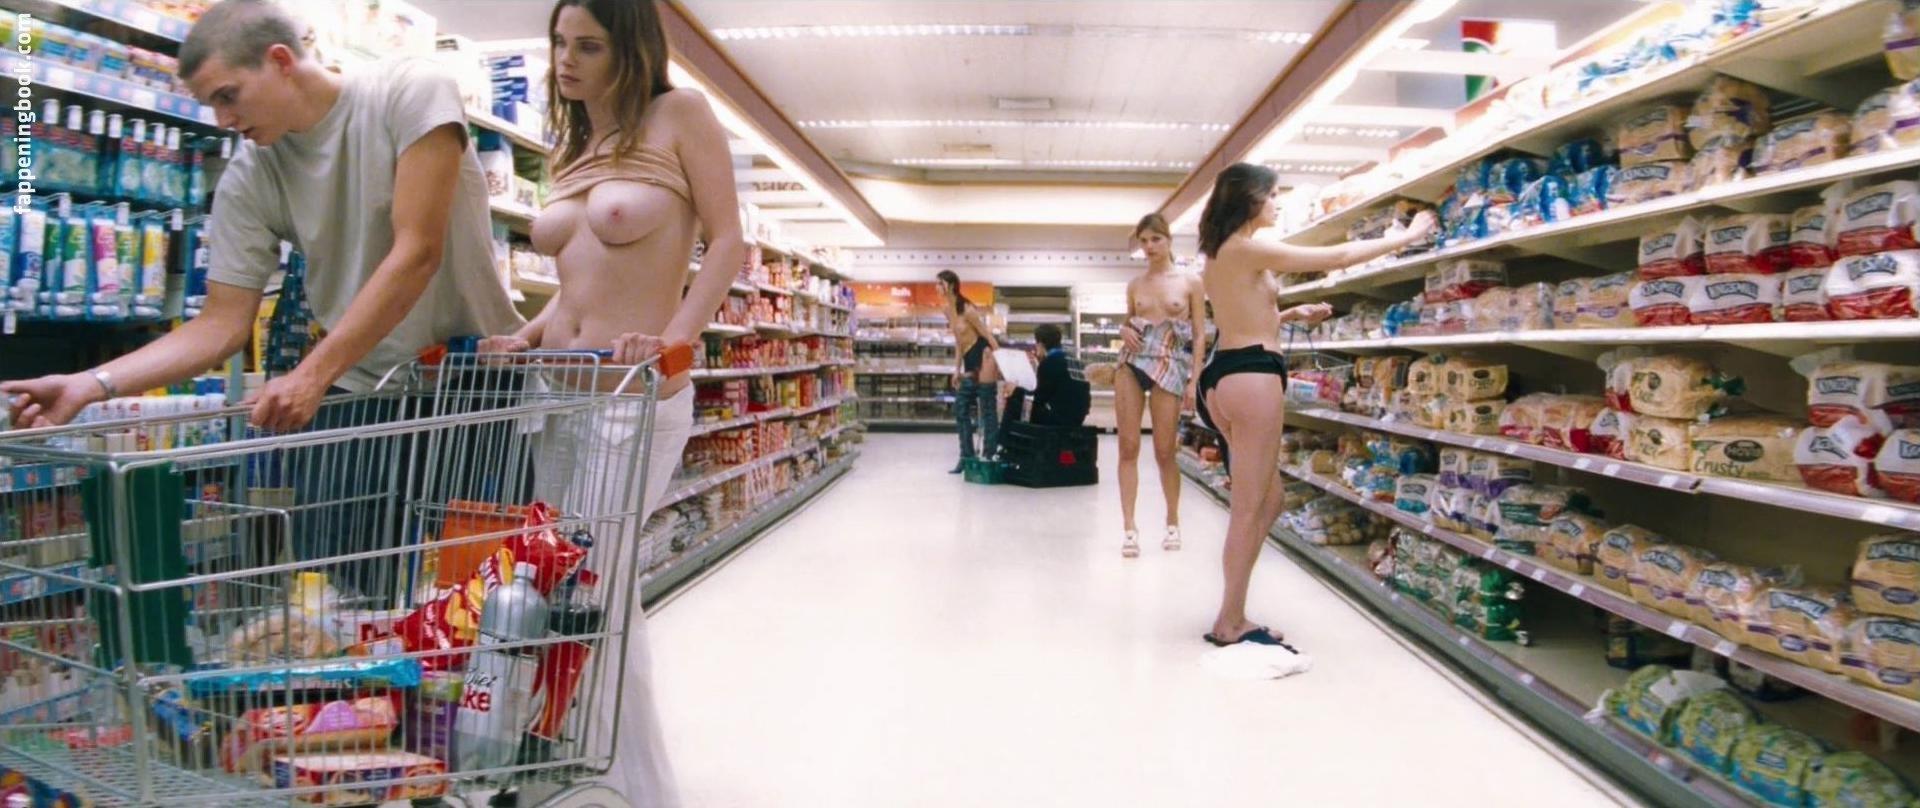 Irene Bagach Nude